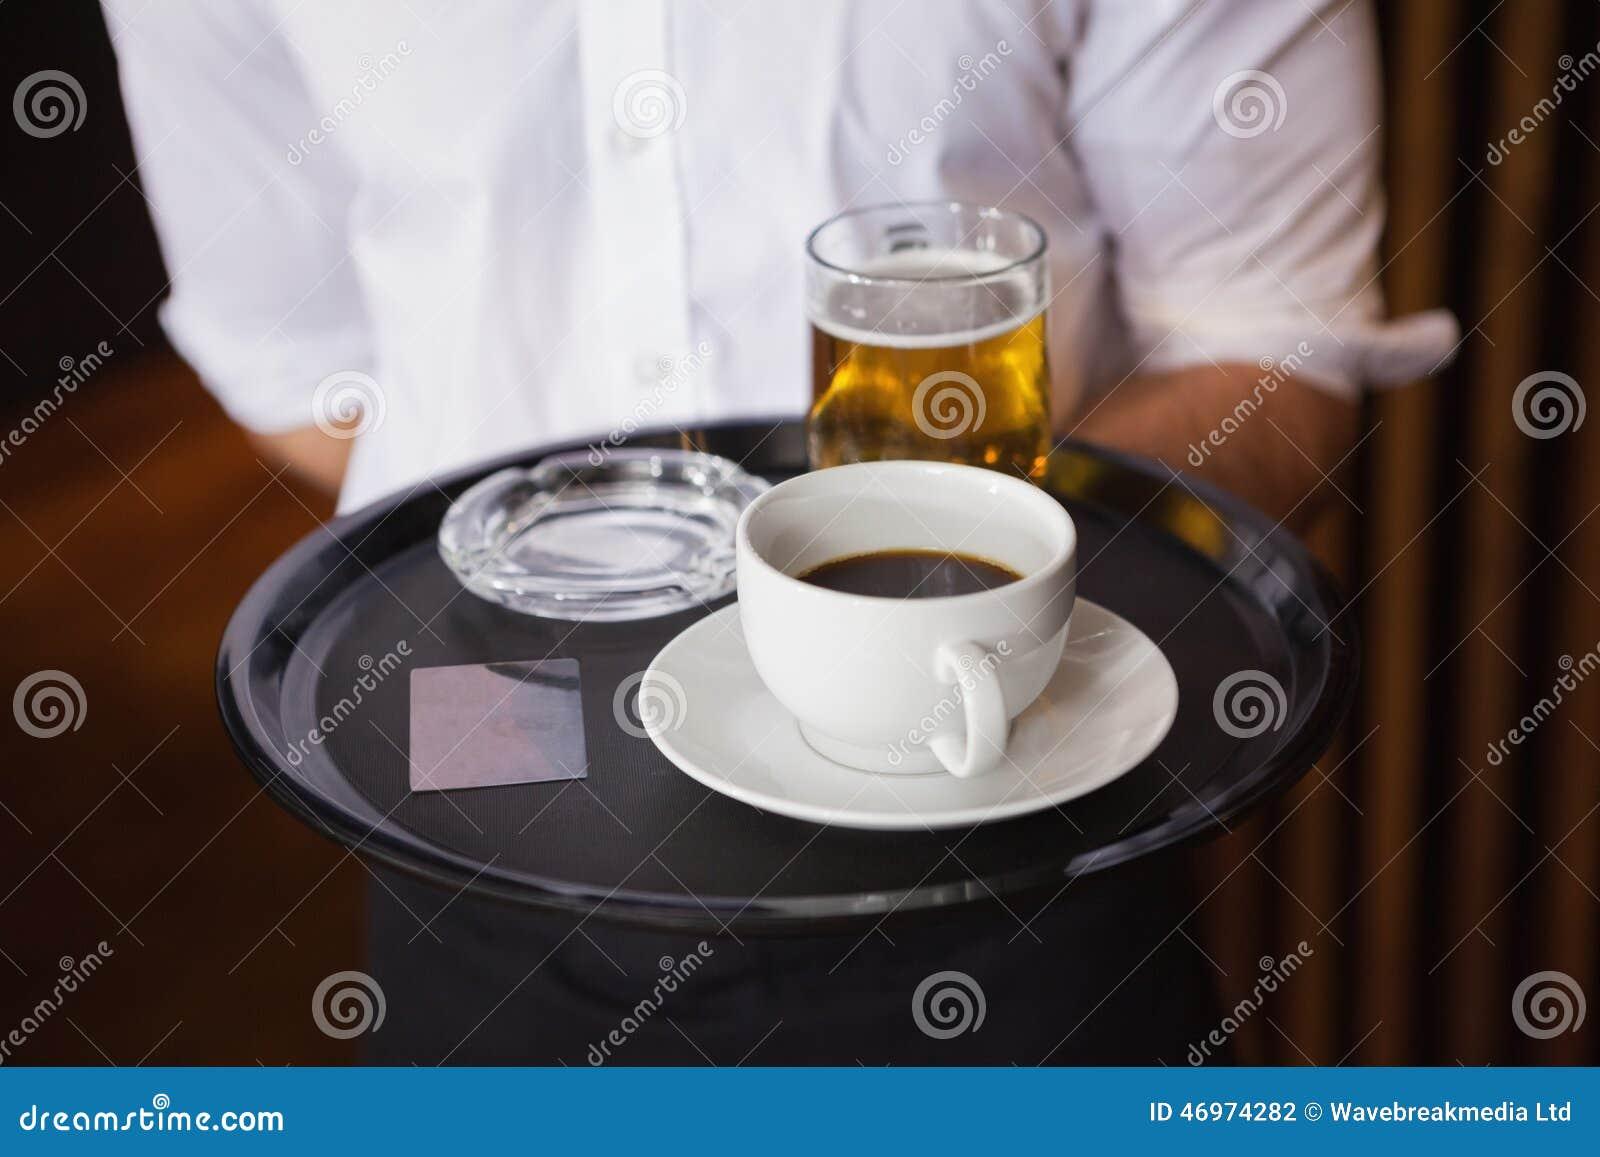 Risultati immagini per birra e caffè